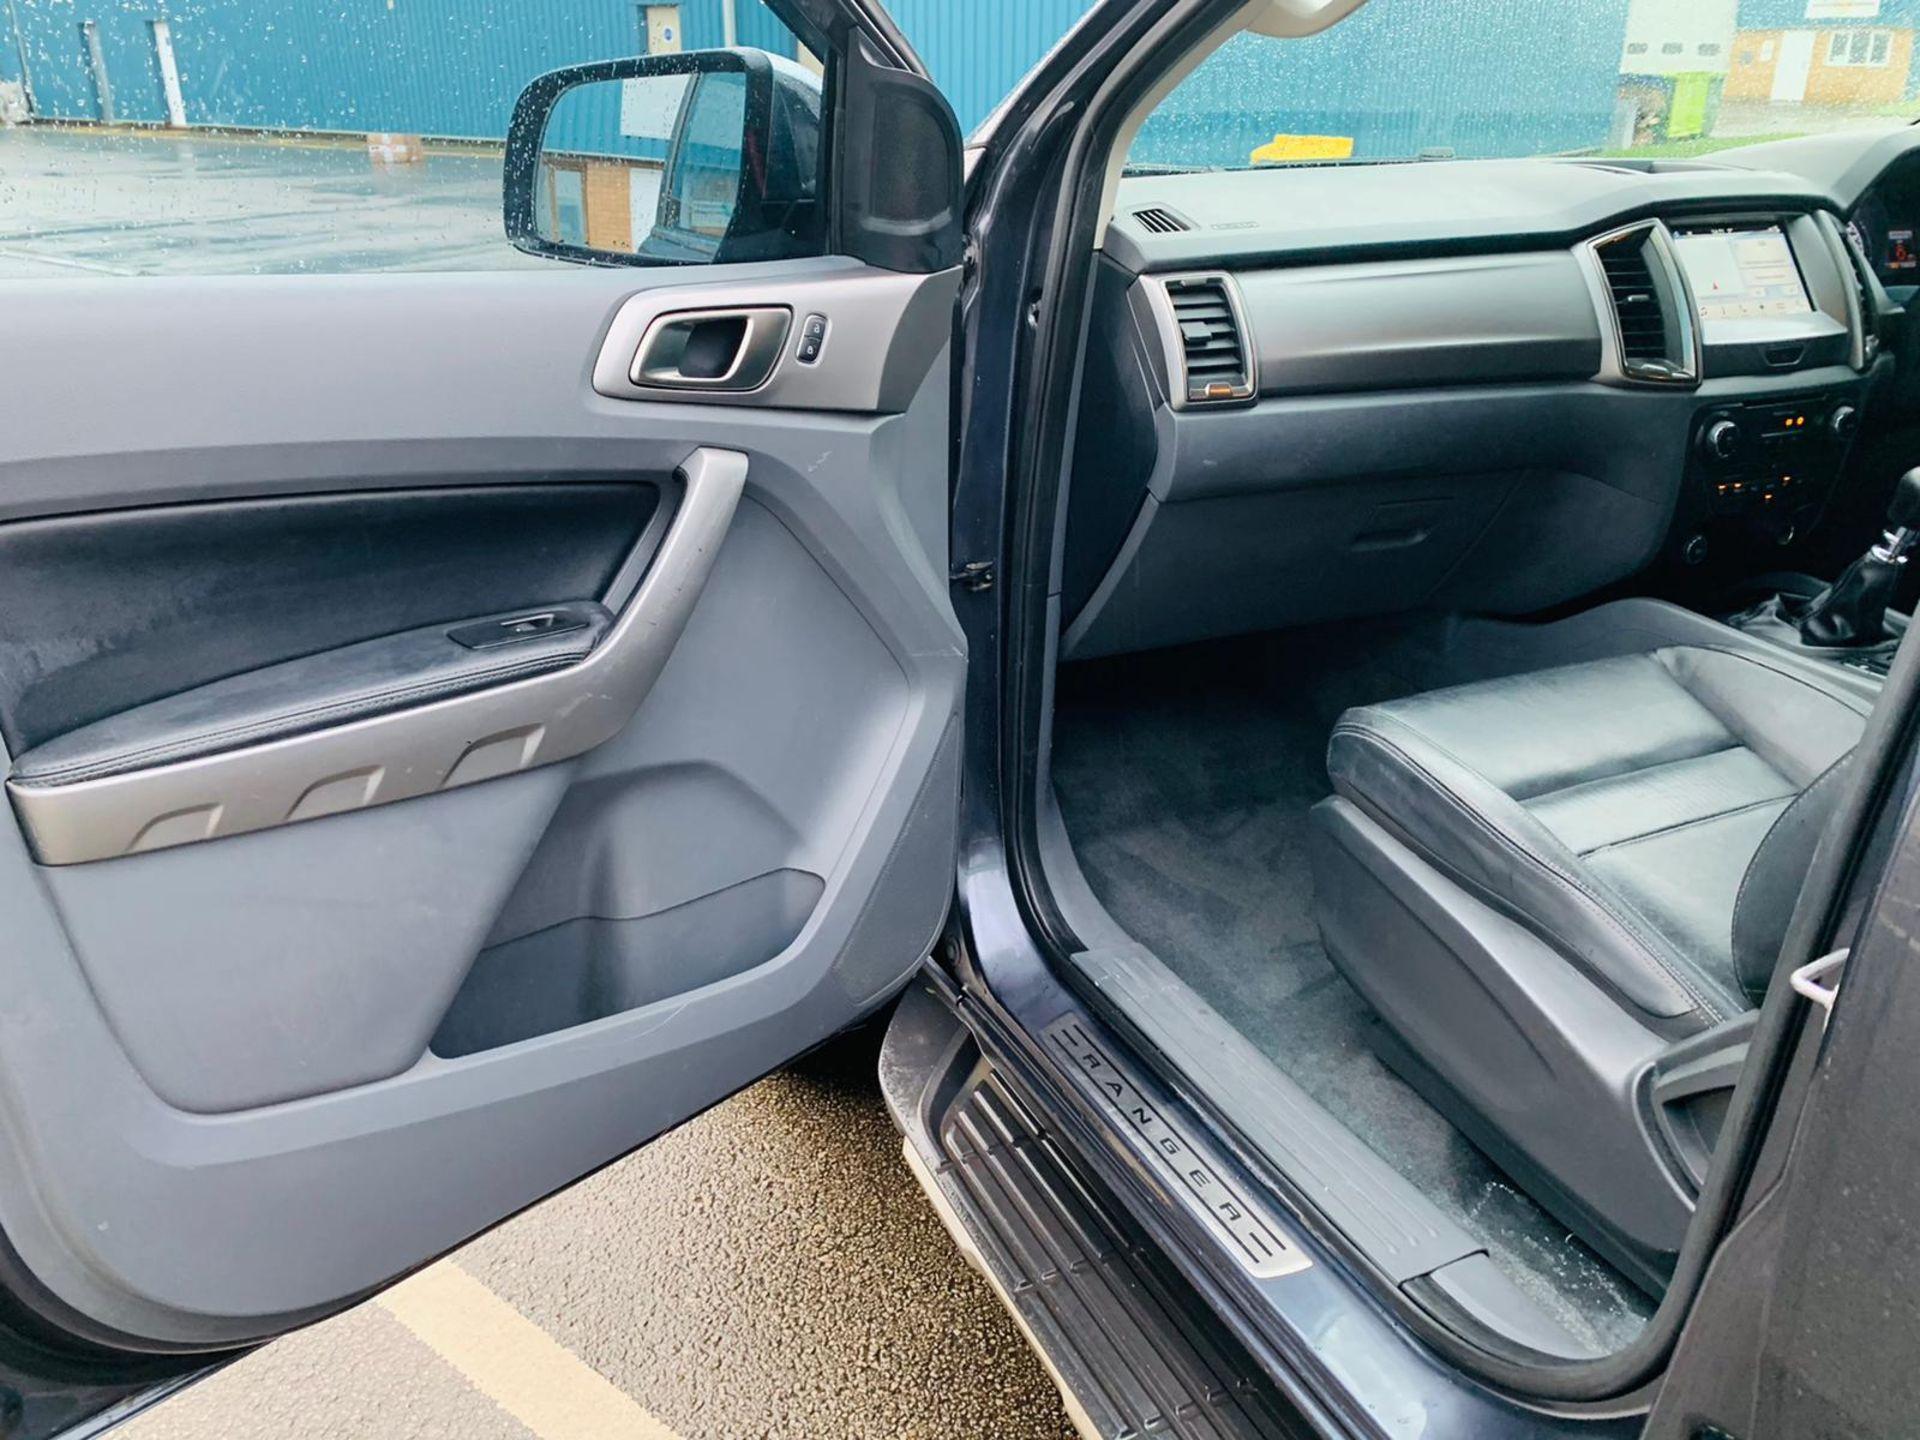 (RESERVE MET) Ford Ranger 2.2 TDCI LTD 4x4 Double Cab 2017 17 Reg - Reversing Cam -Leather - Sat Nav - Image 28 of 32